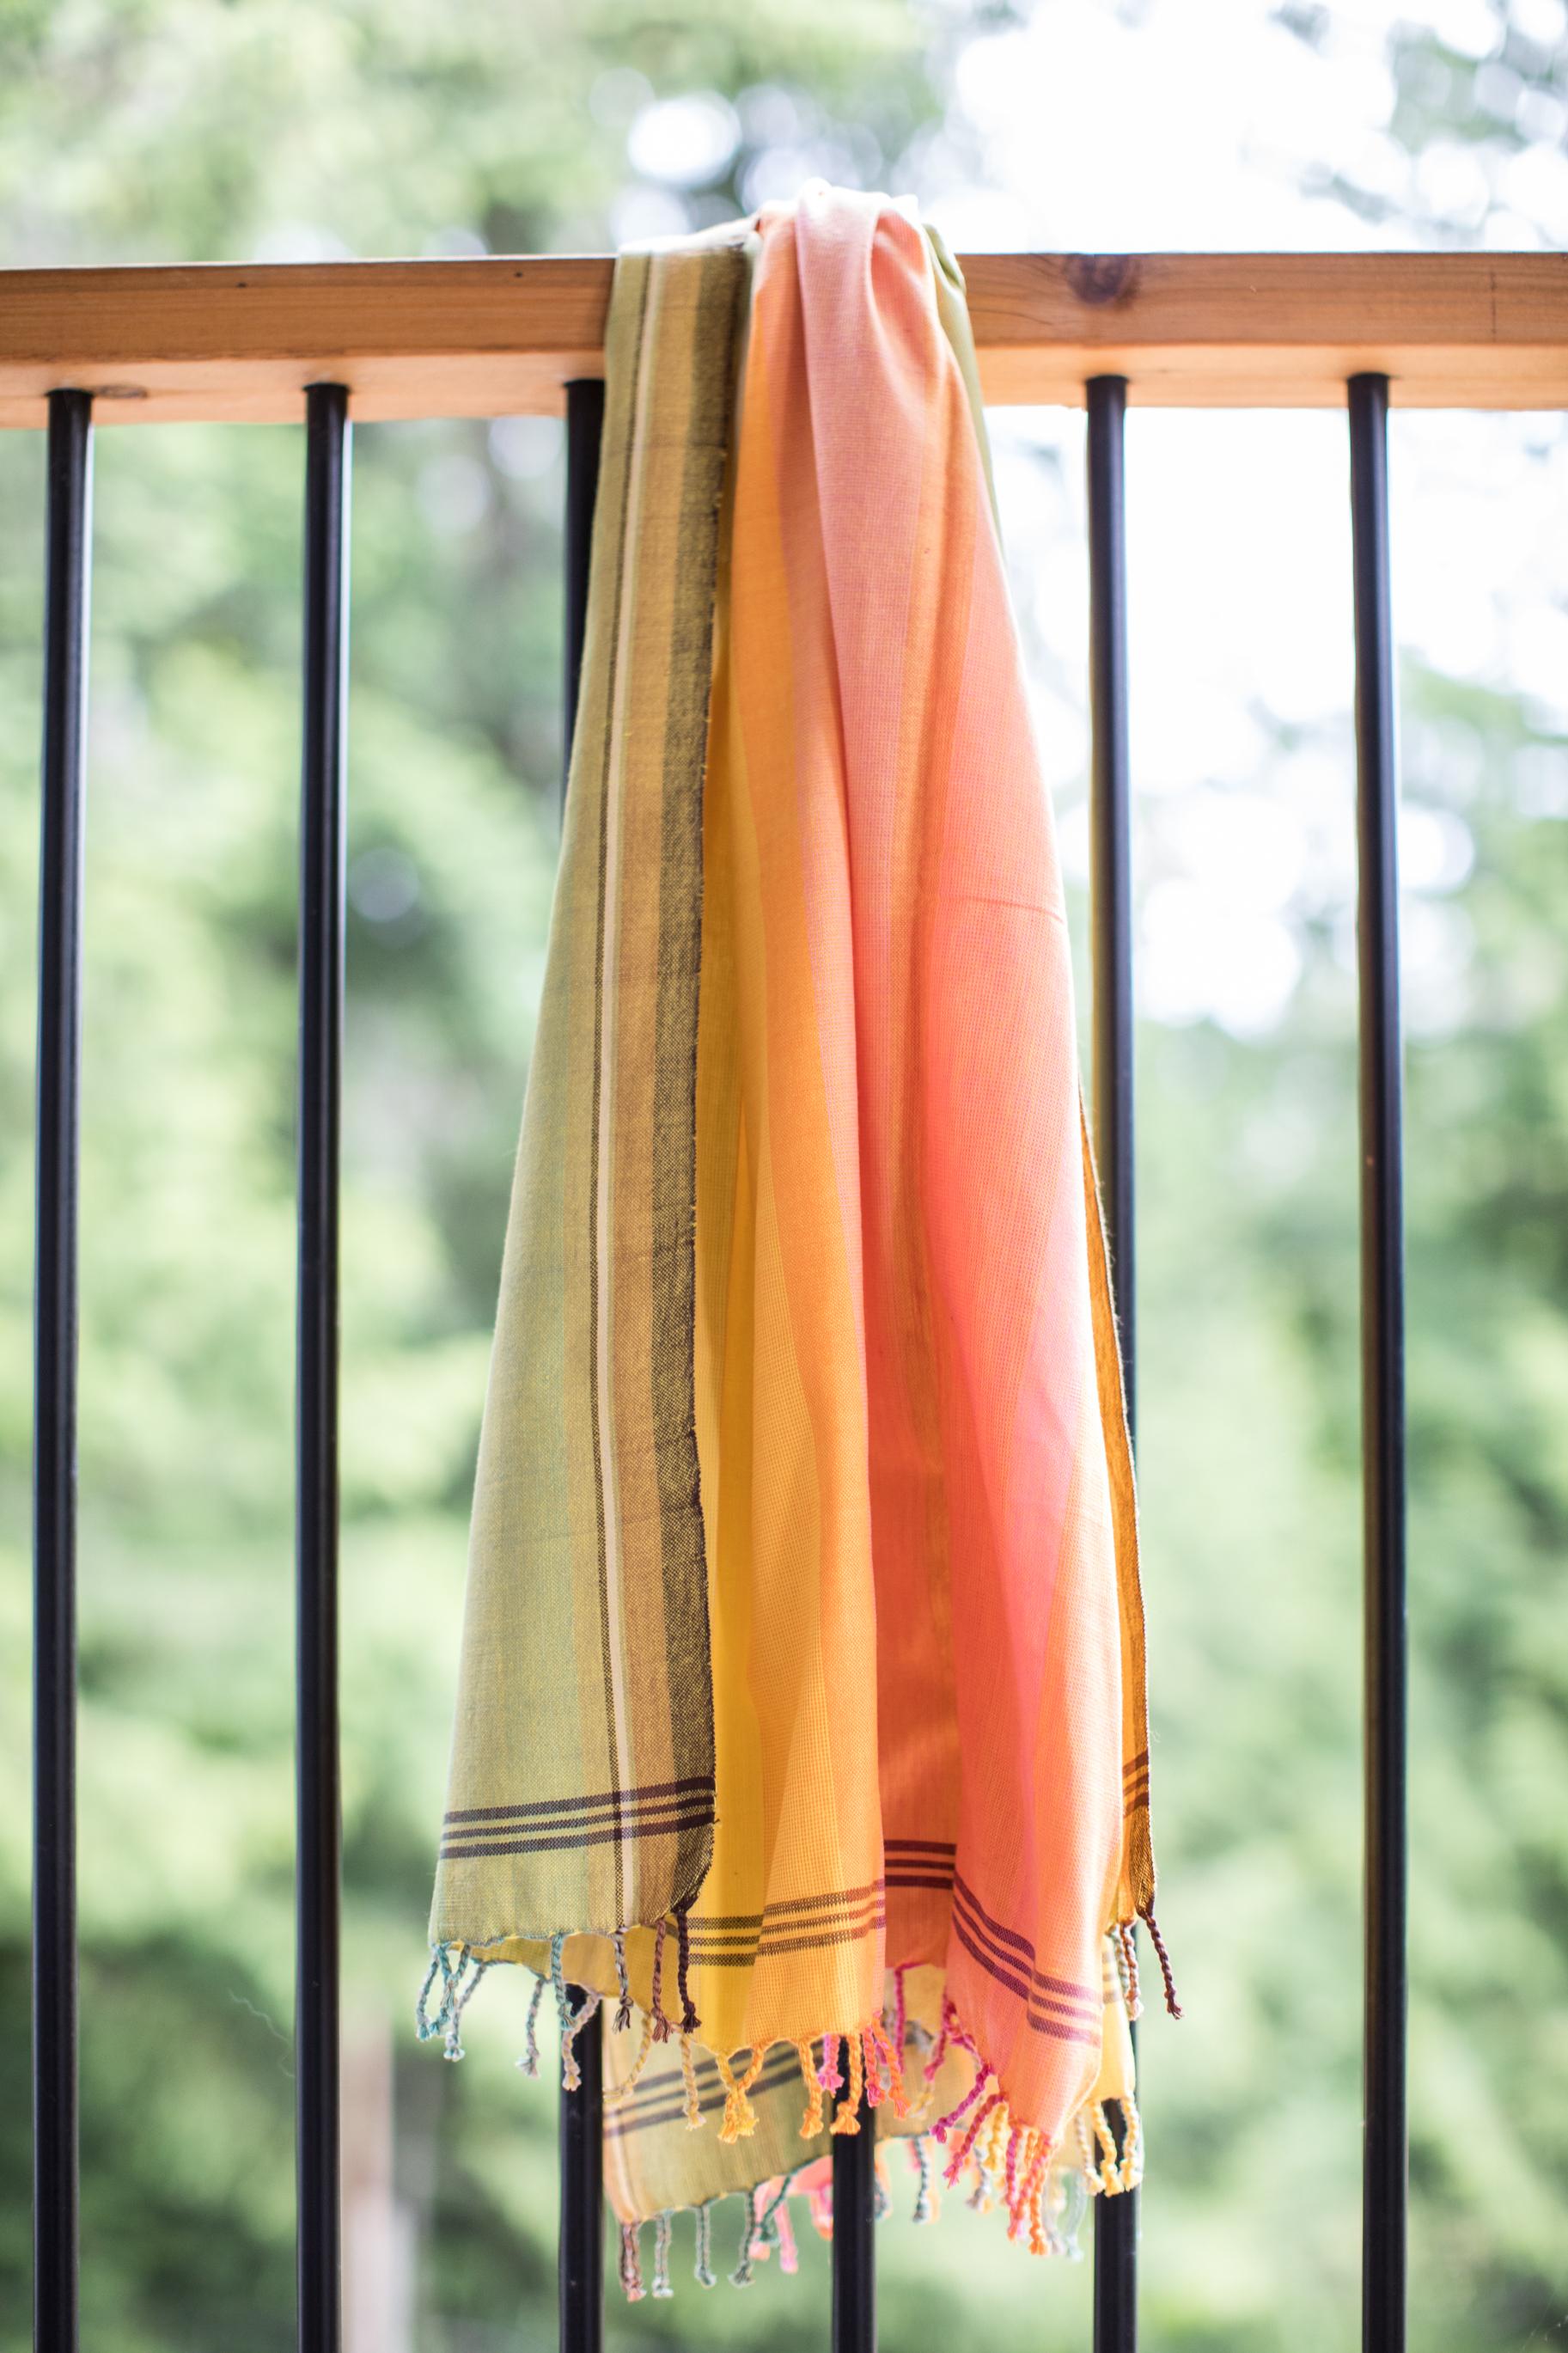 rudi-textiles-185-of-205.jpg